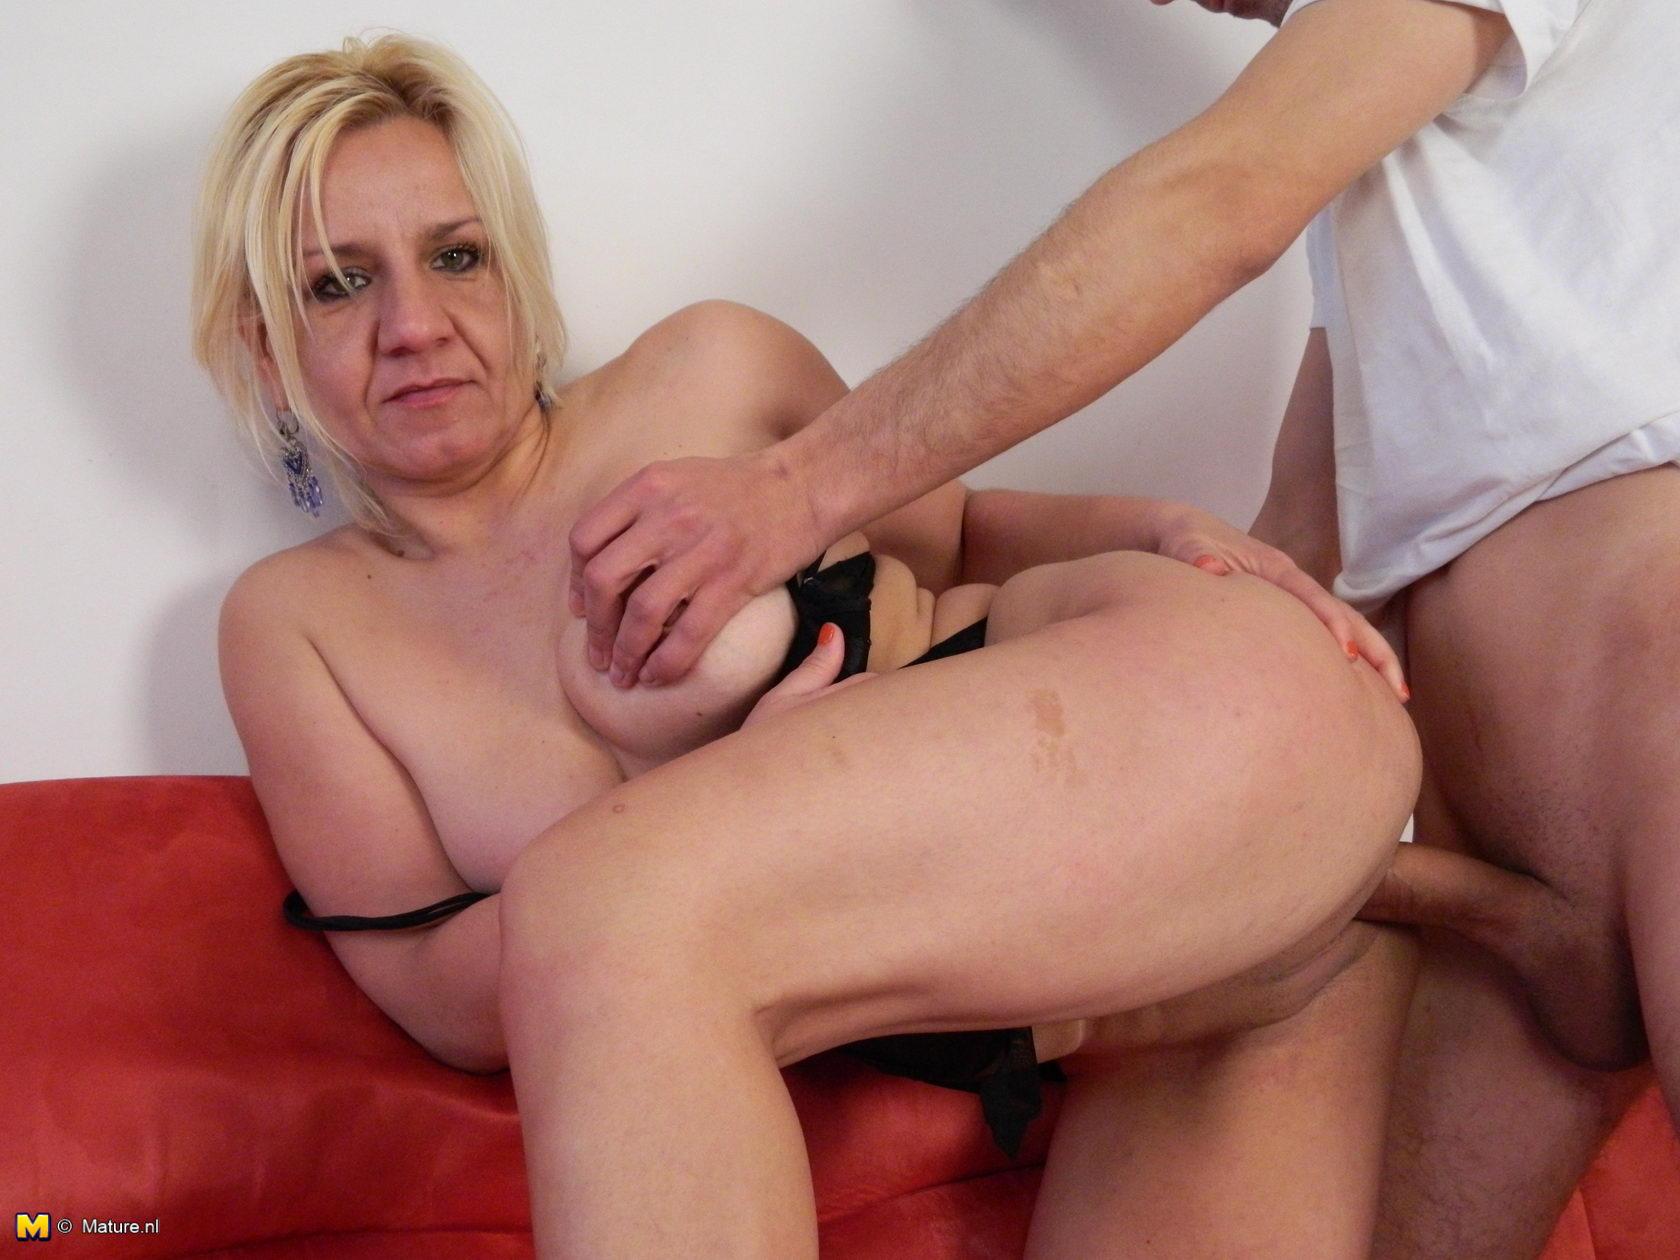 nude fatty wife slim husband pic